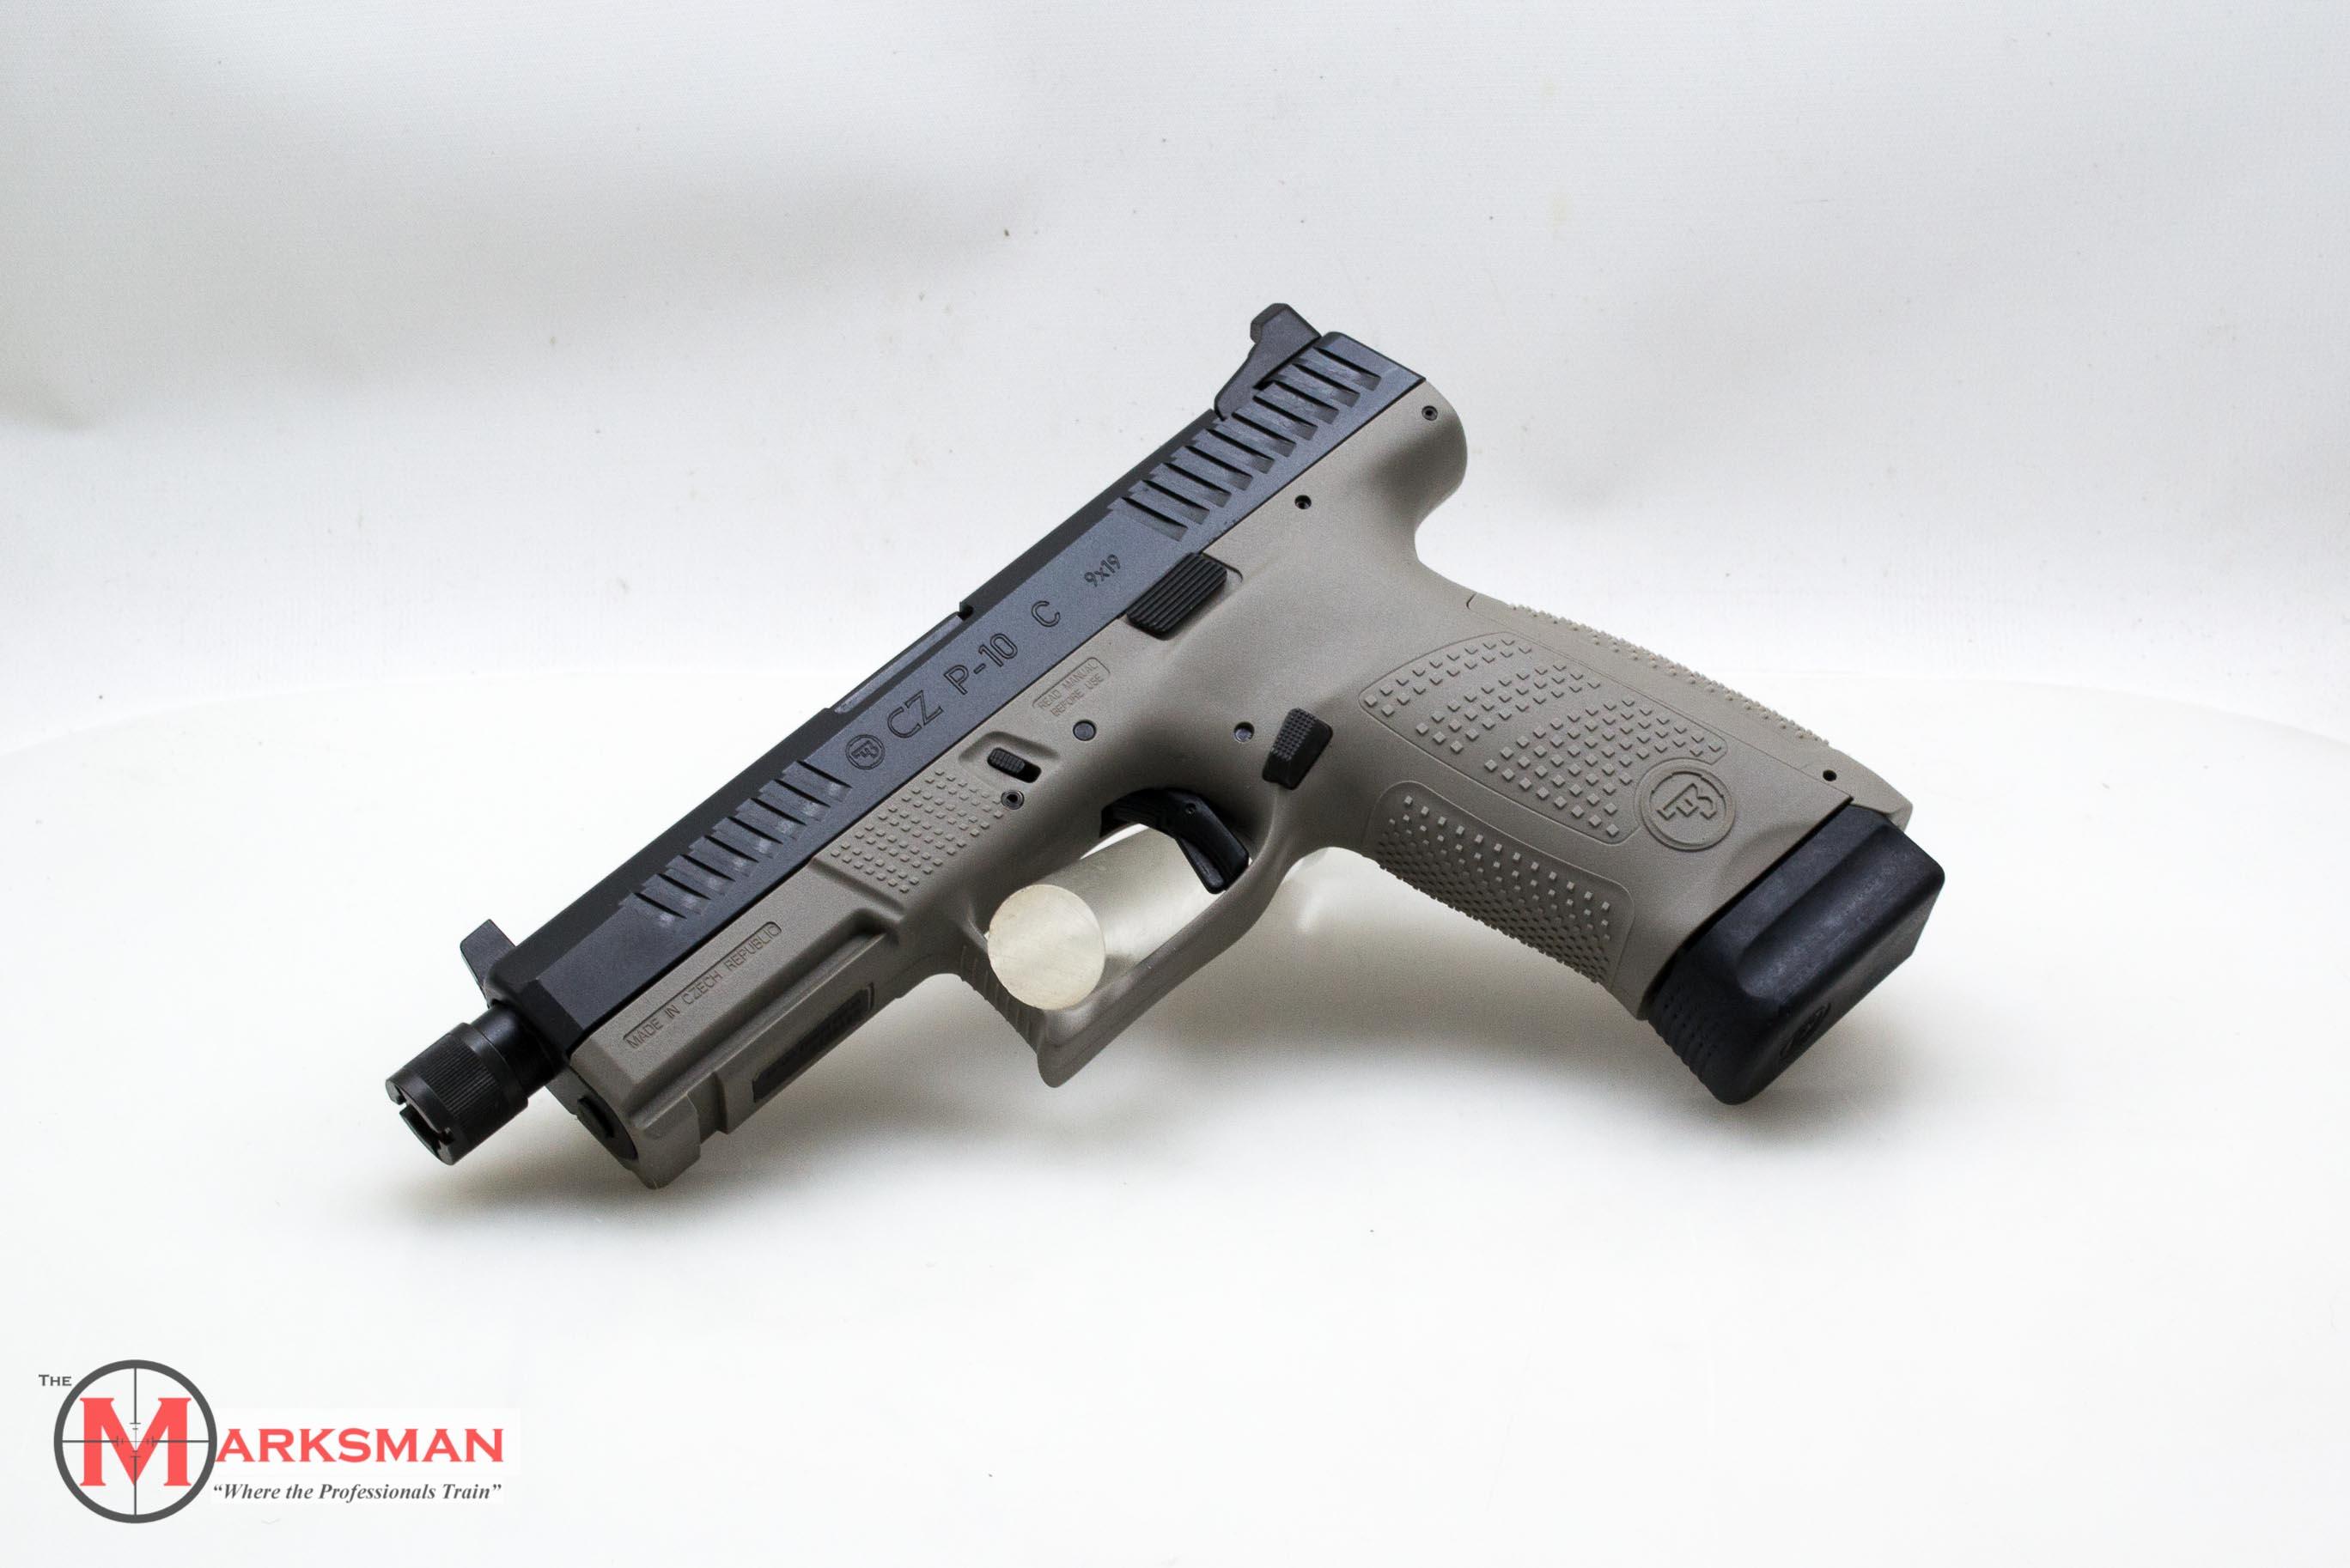 CZ P-10 C Suppressor Ready 9mm NEW Urban Grey - Semi Auto Pistols at